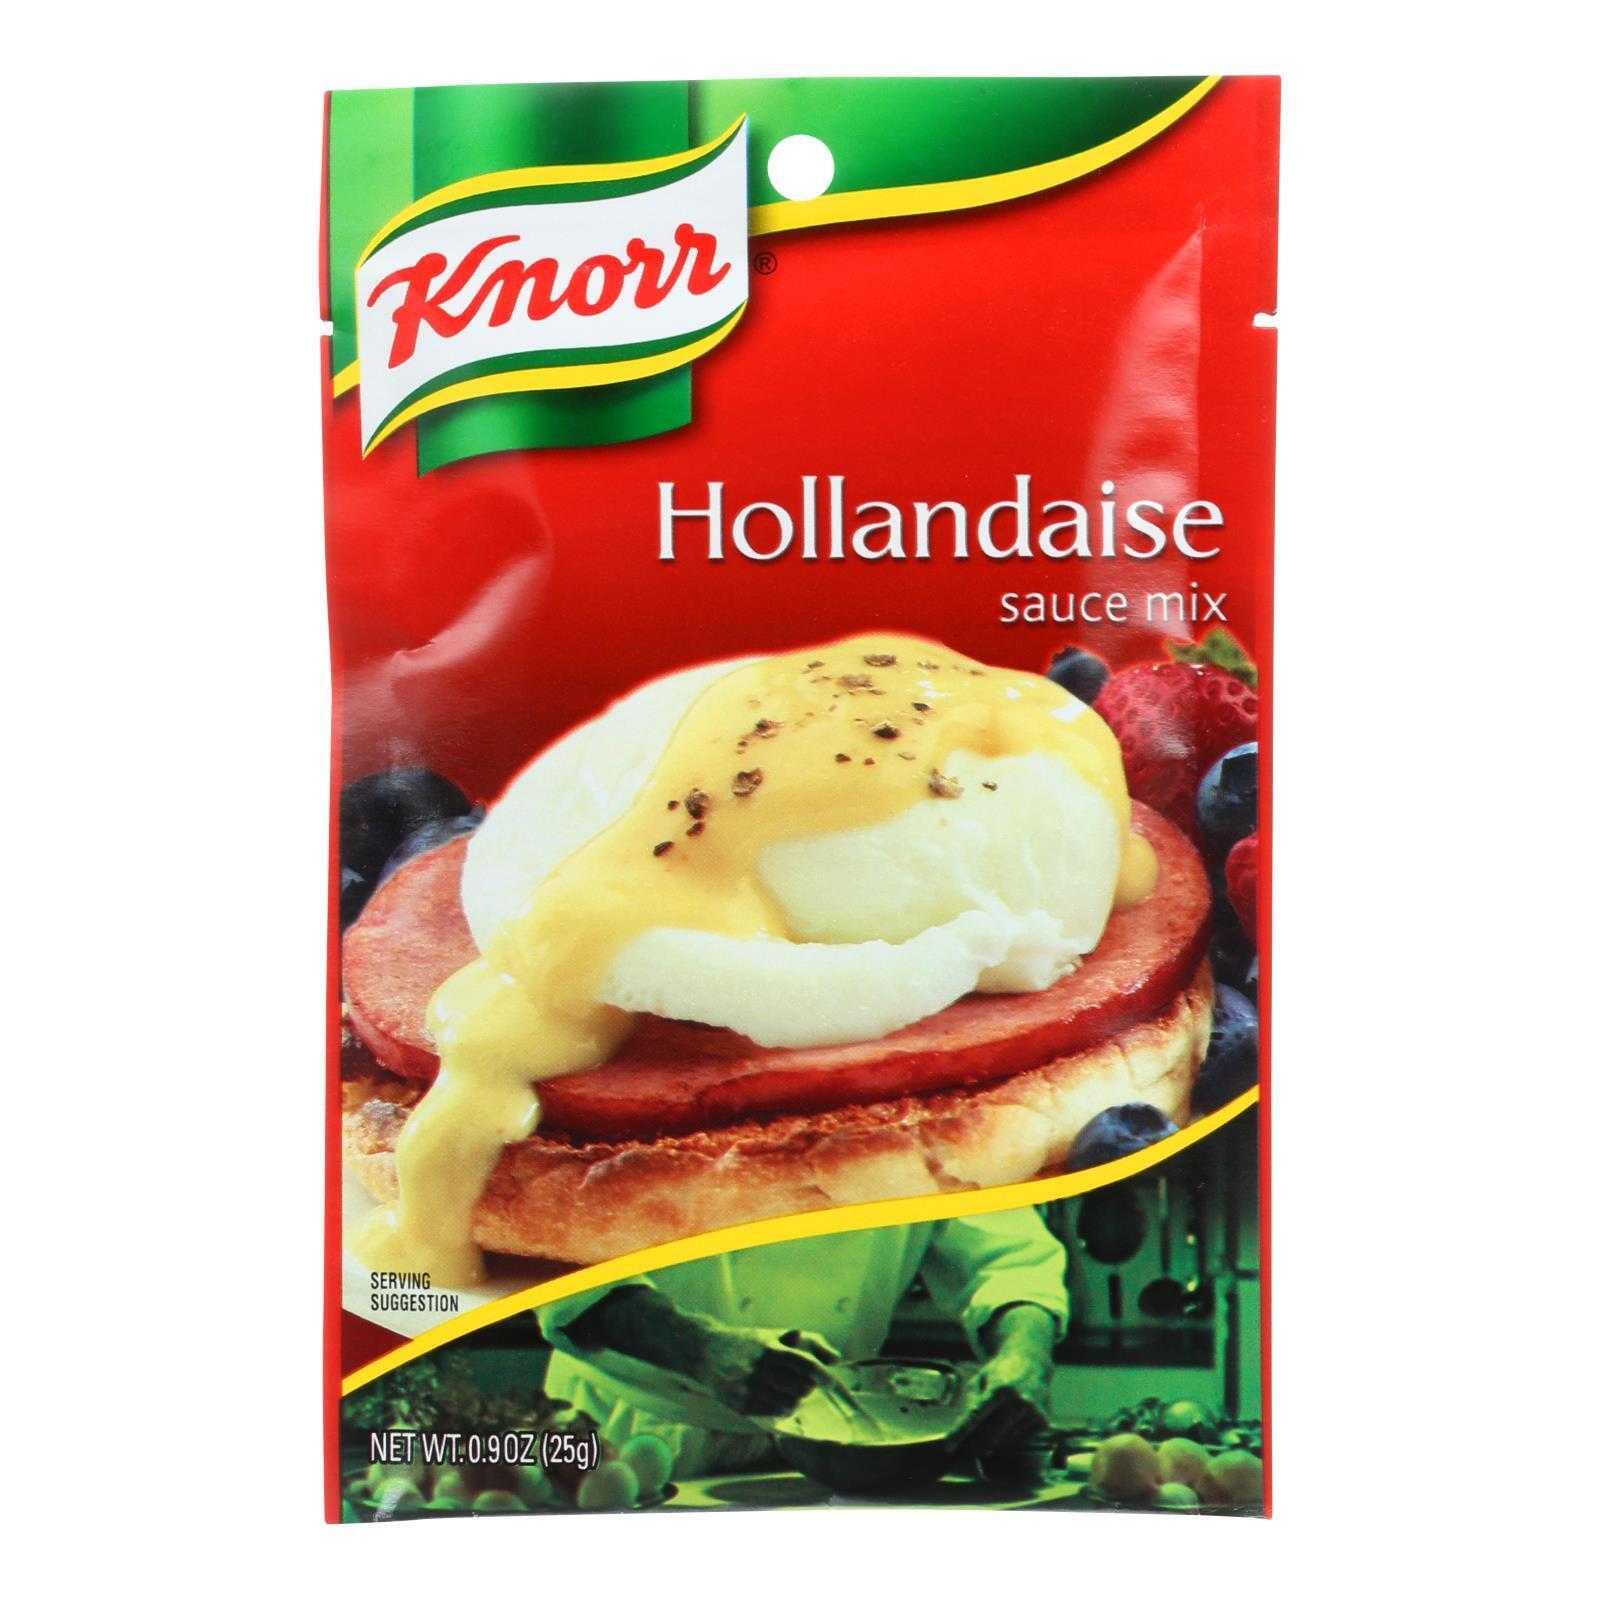 Knorr Sauce Mix - Hollandaise - .9 oz - Case of 12